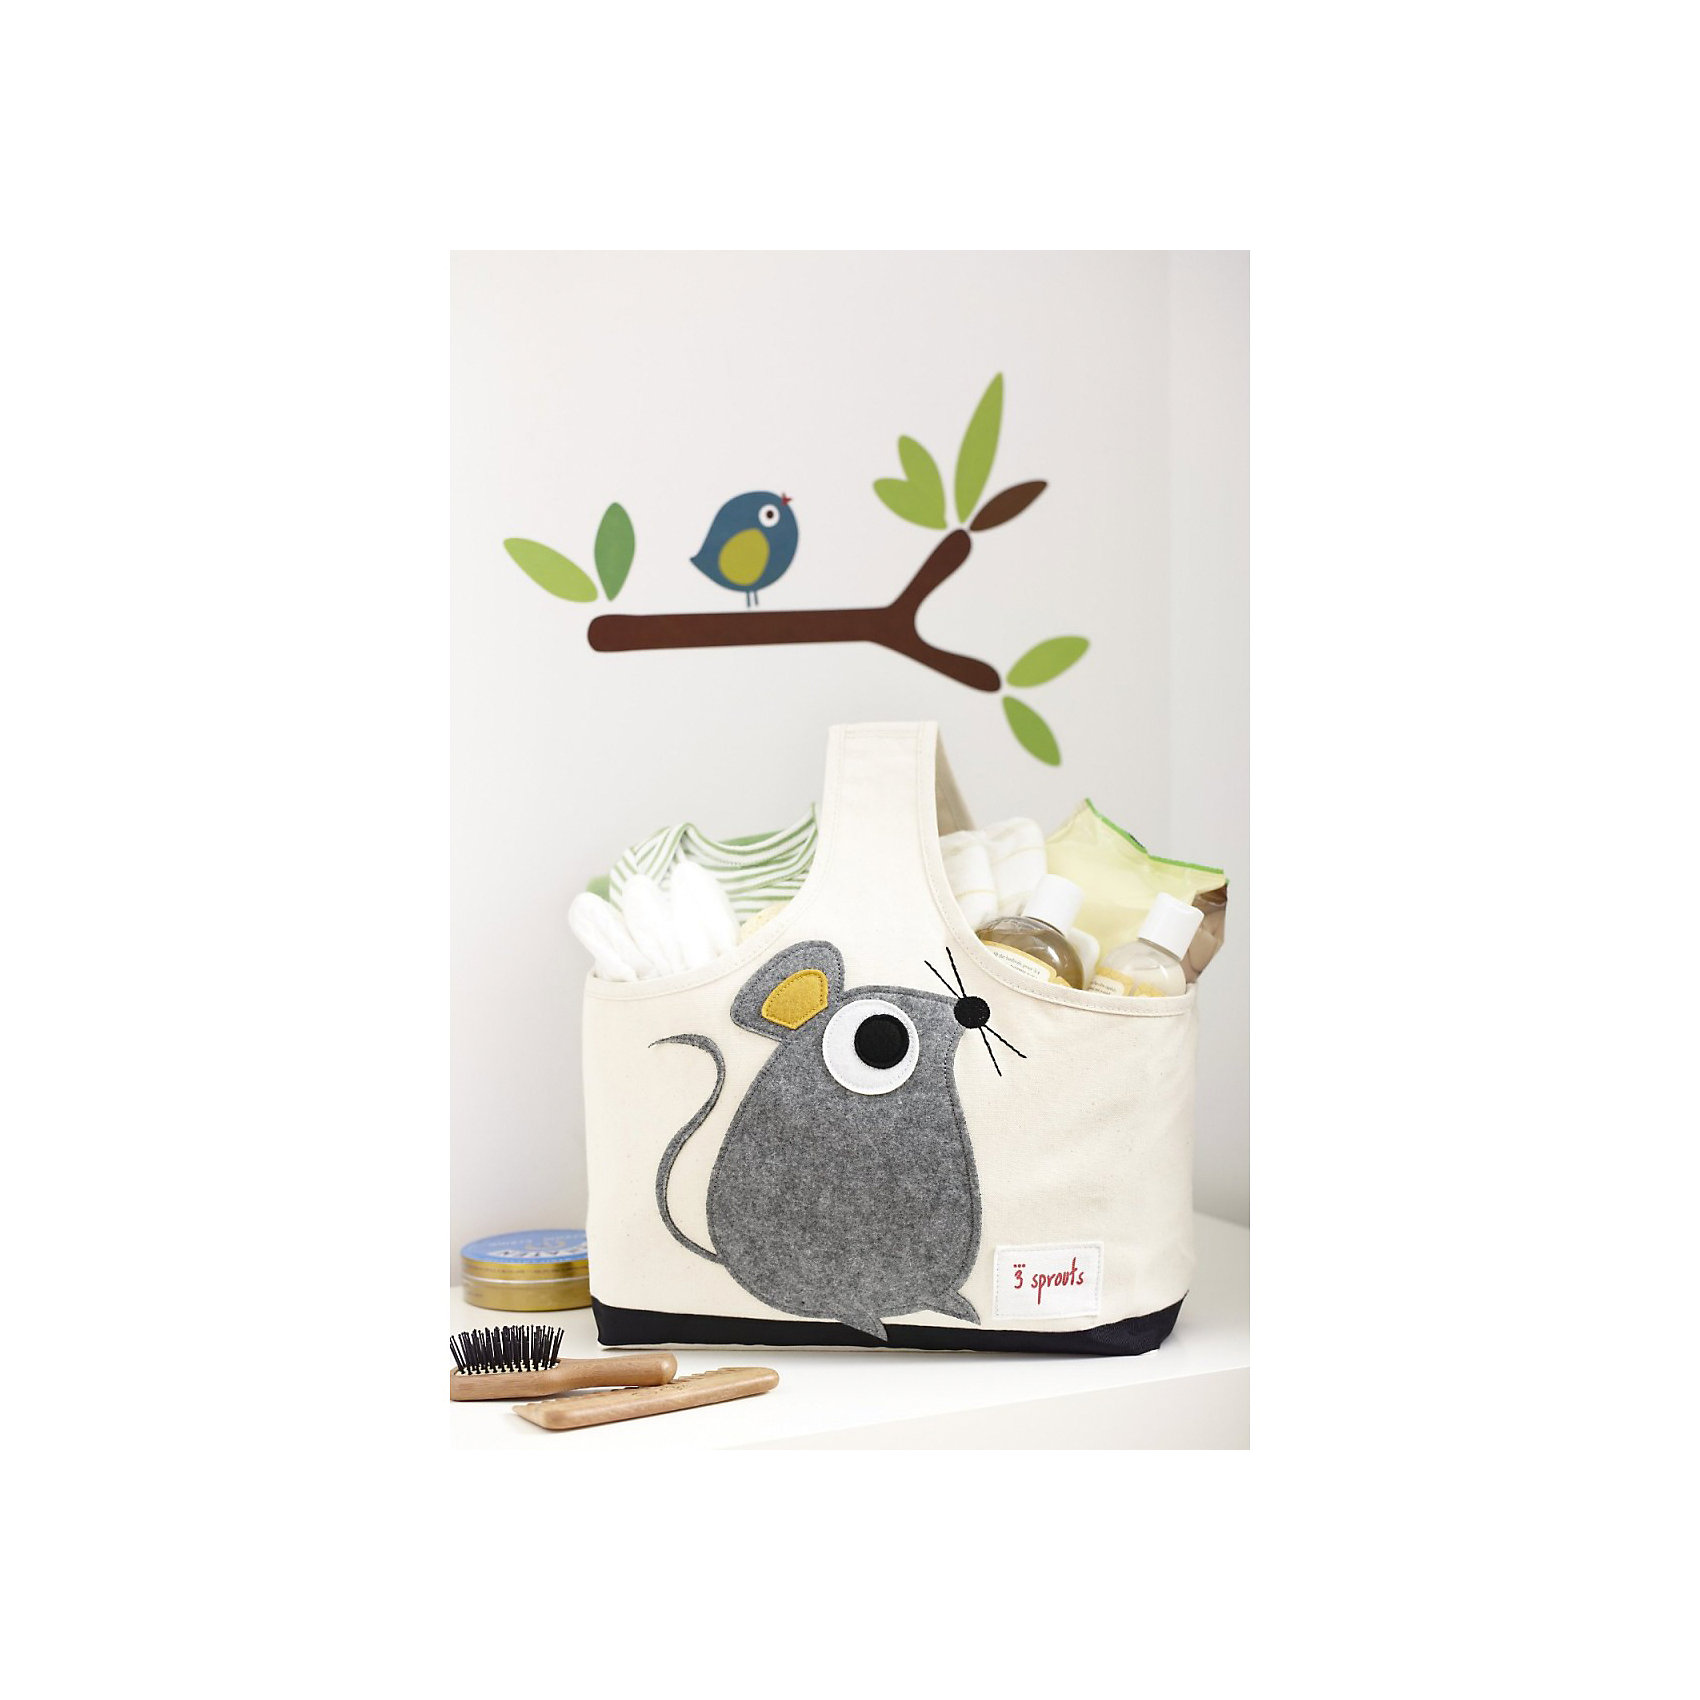 Сумочка для хранения детских принадлежностей Сова (Purple Owl), 3 Sprouts от myToys